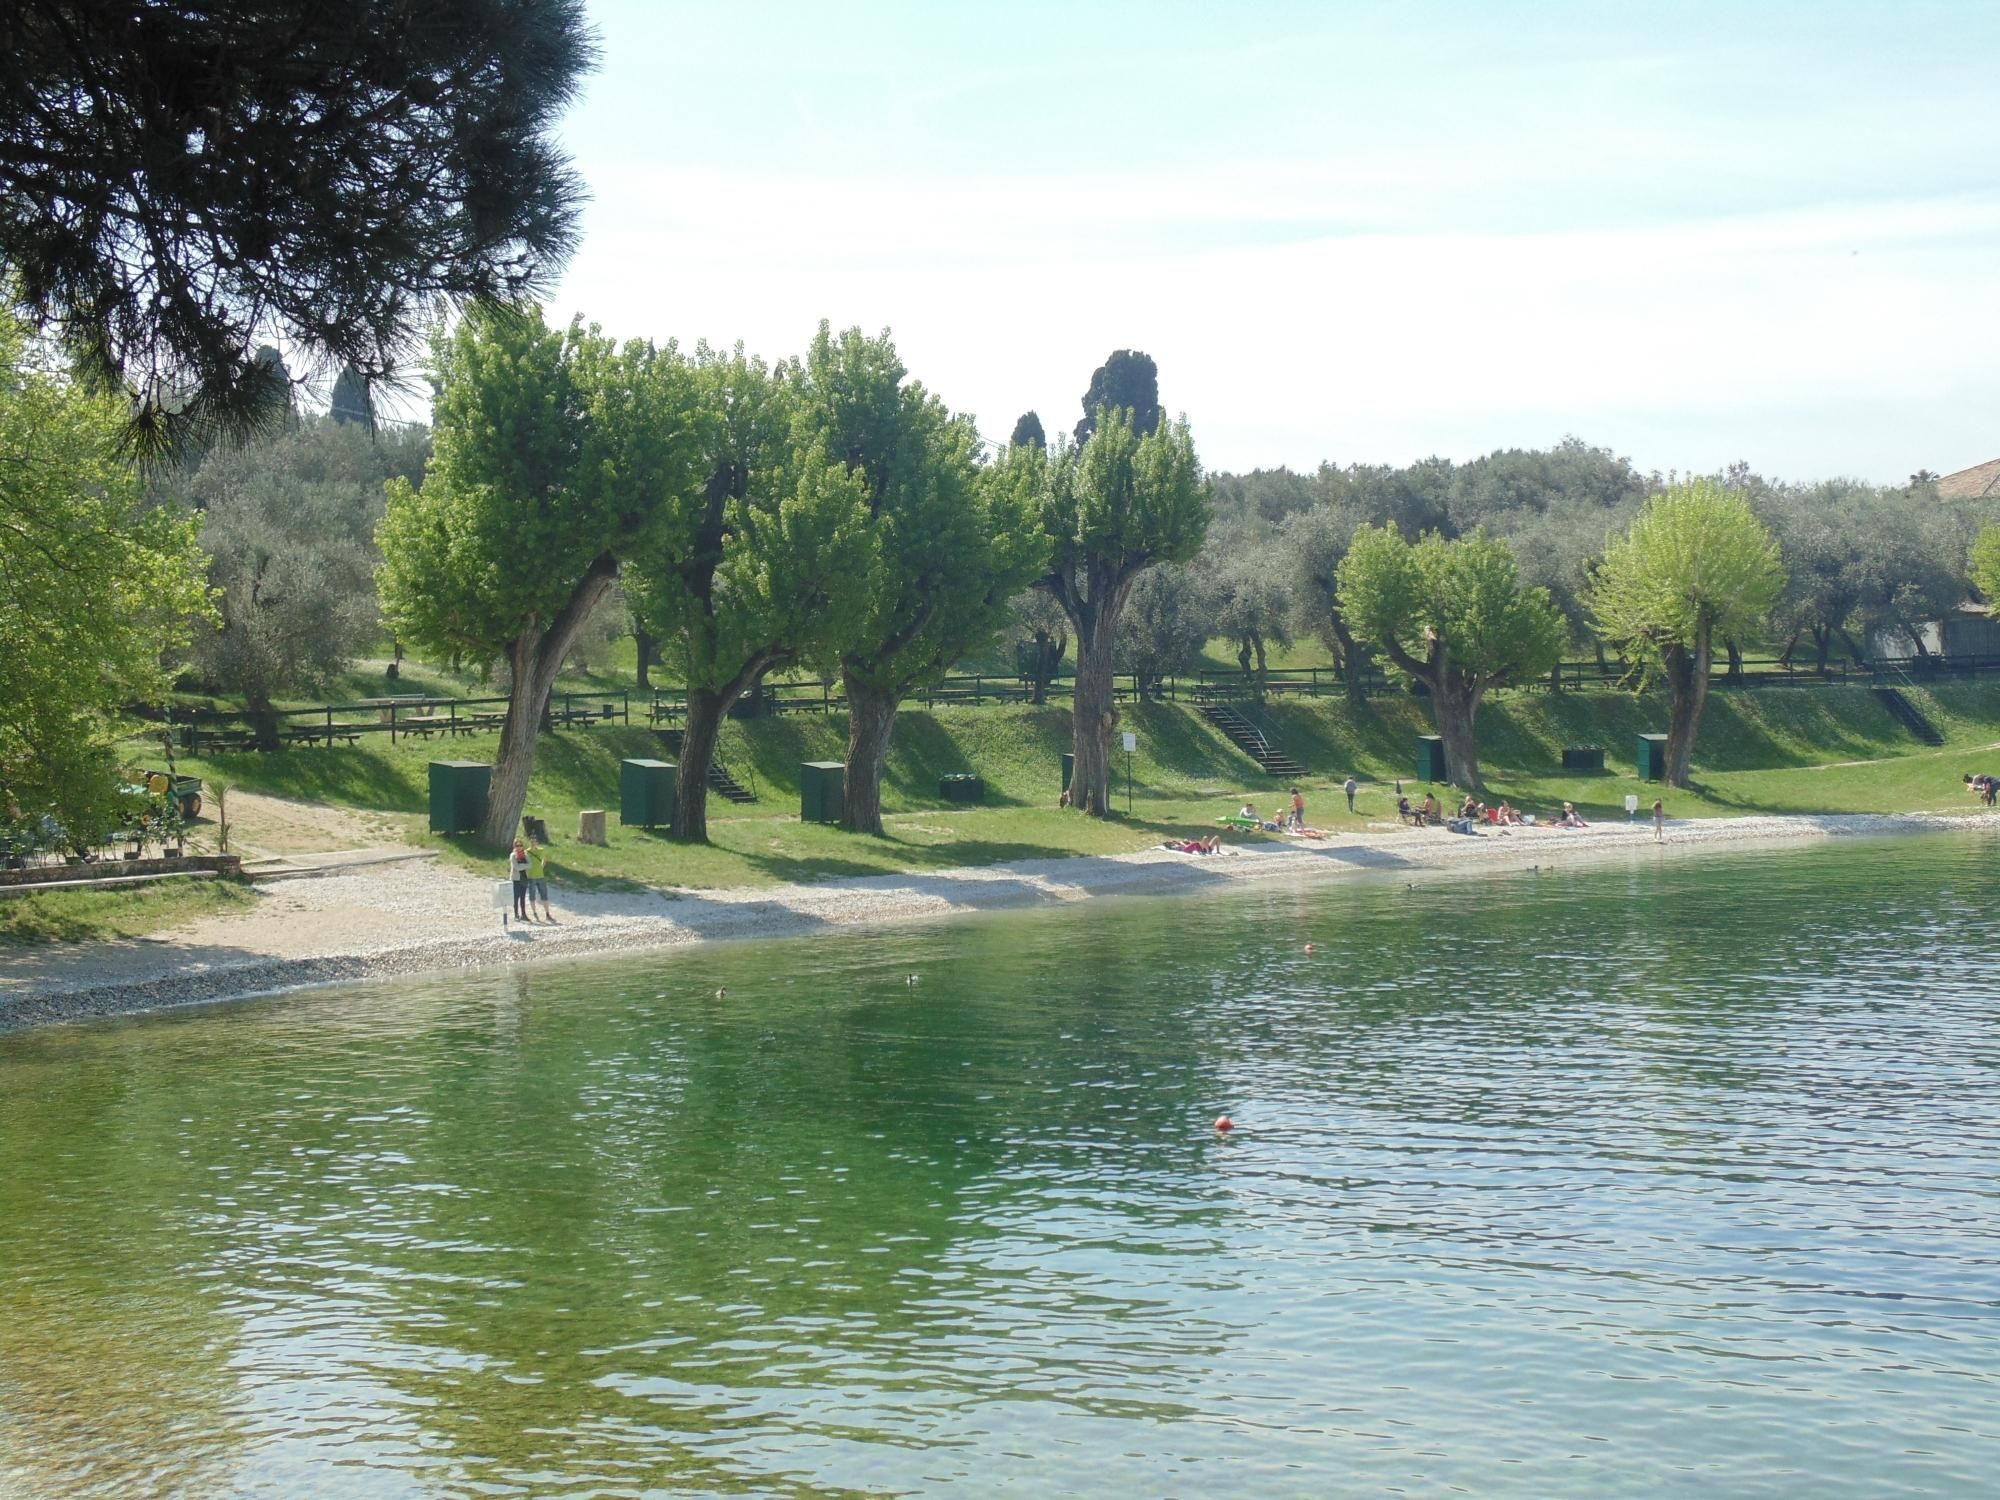 Parco Baia Delle Sirene Garda See 232 Reviews Articles And 118